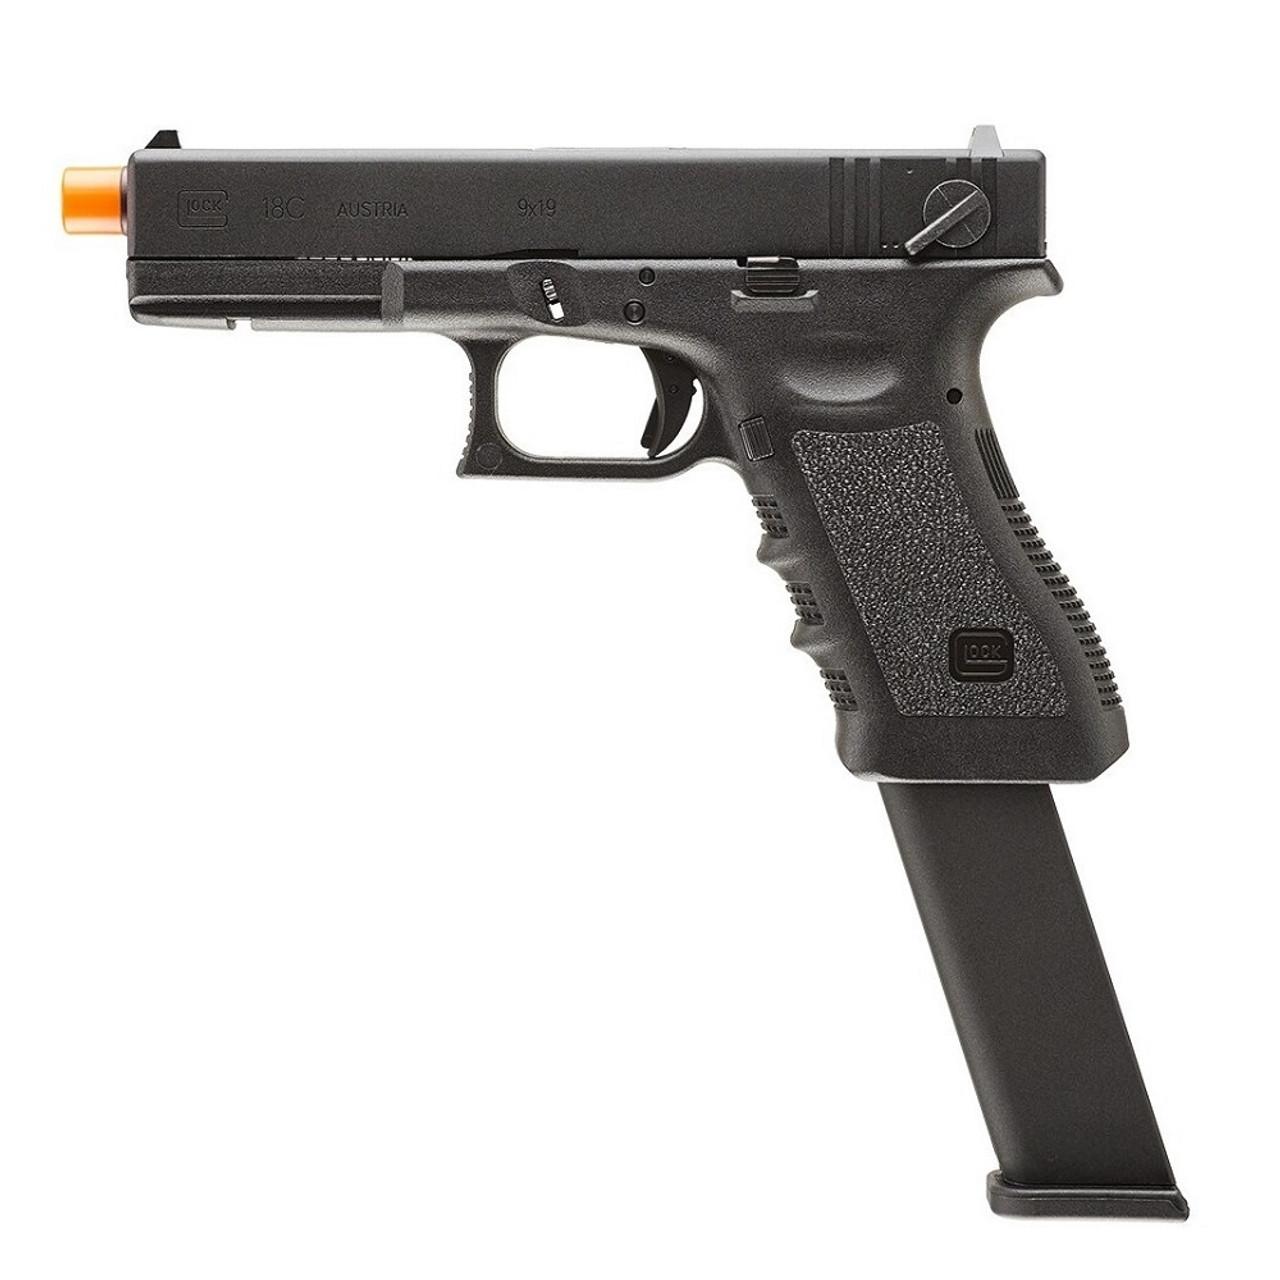 Glock Airsoft Guns